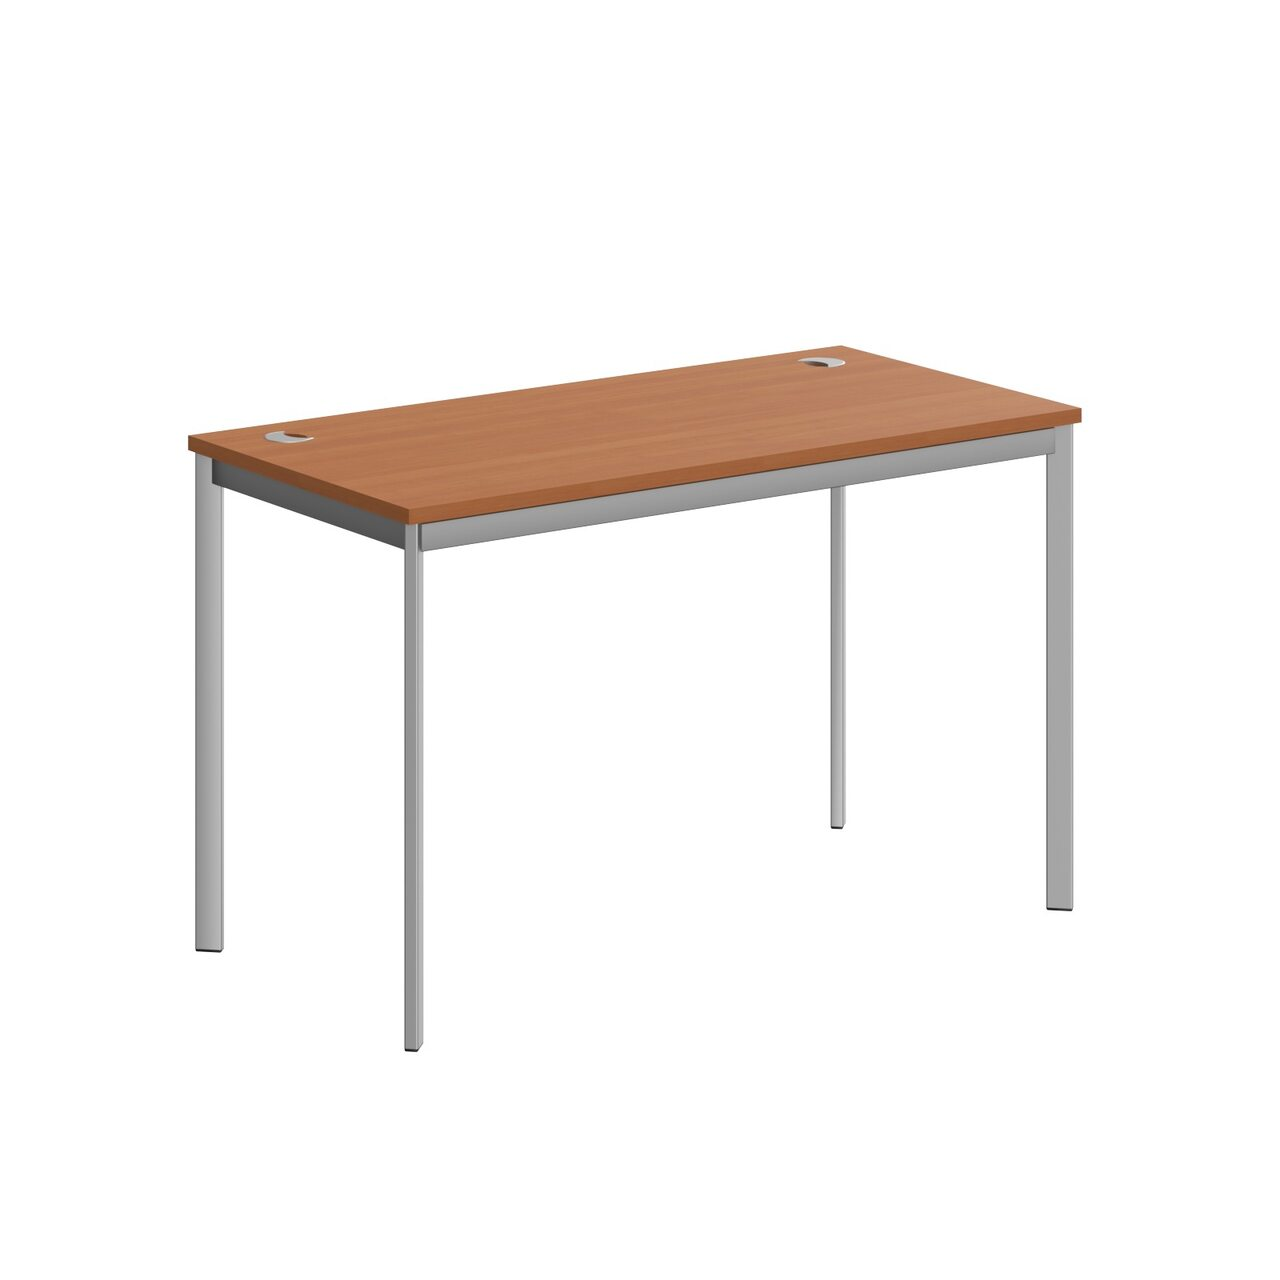 Стол прямой  IMAGO-S 120x60x76 - фото 6